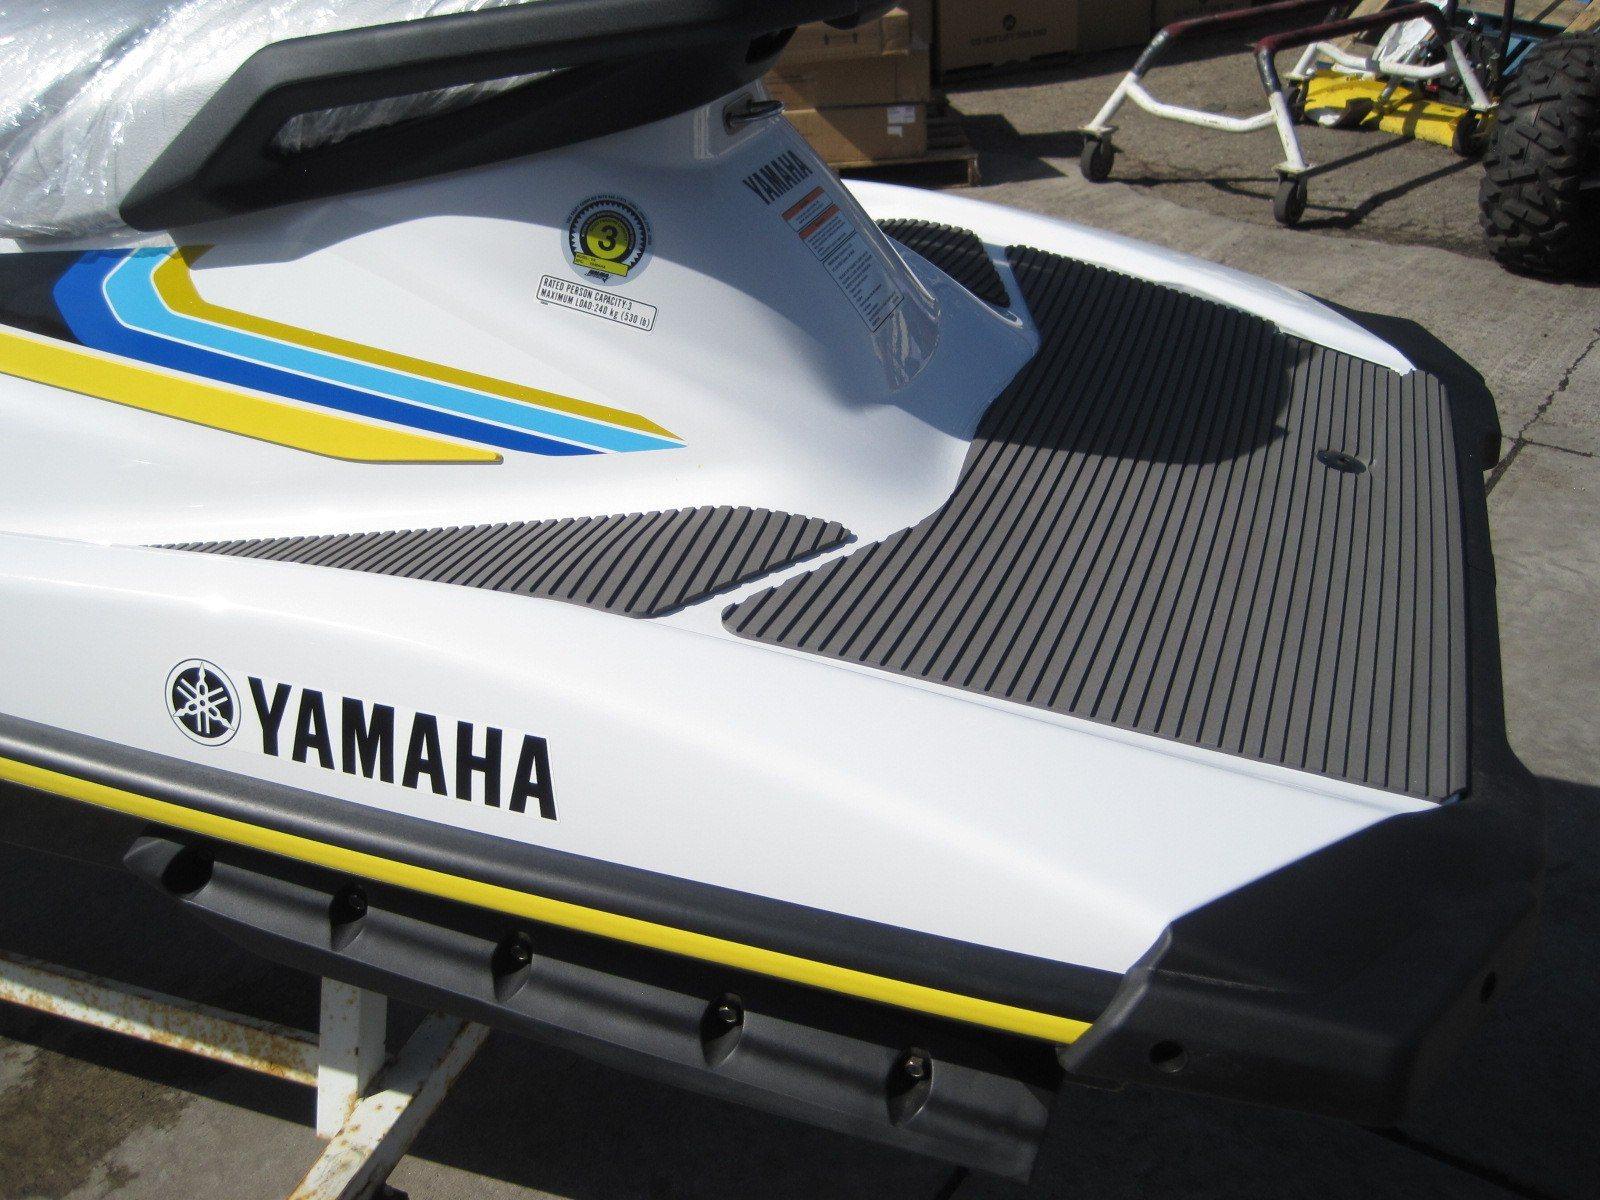 2016 Yamaha VX in Denver, Colorado